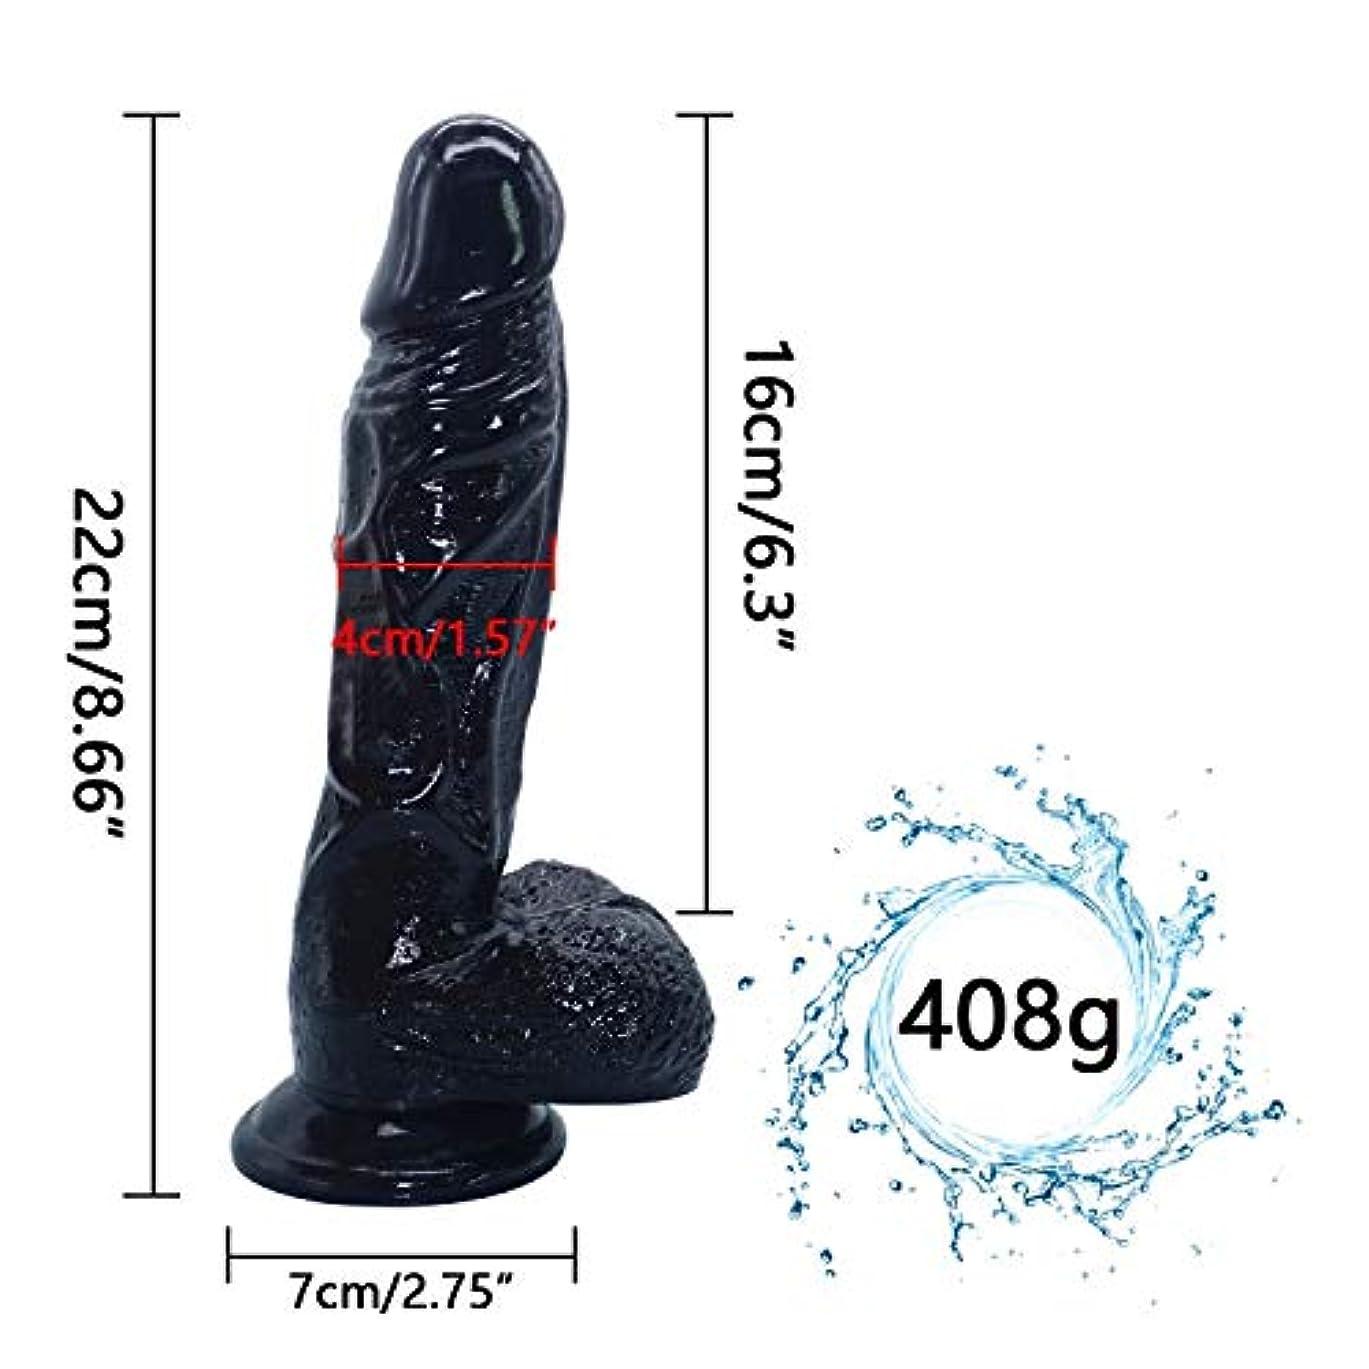 ChenXiDian 8.86インチの巨大な親密な初心者現実的な防水黒肉滑らかなテクスチャシャフト????????????ラバーソロプレイBackdoorMassager Veinedスティック柔軟な浸透-抗菌、より優れた...